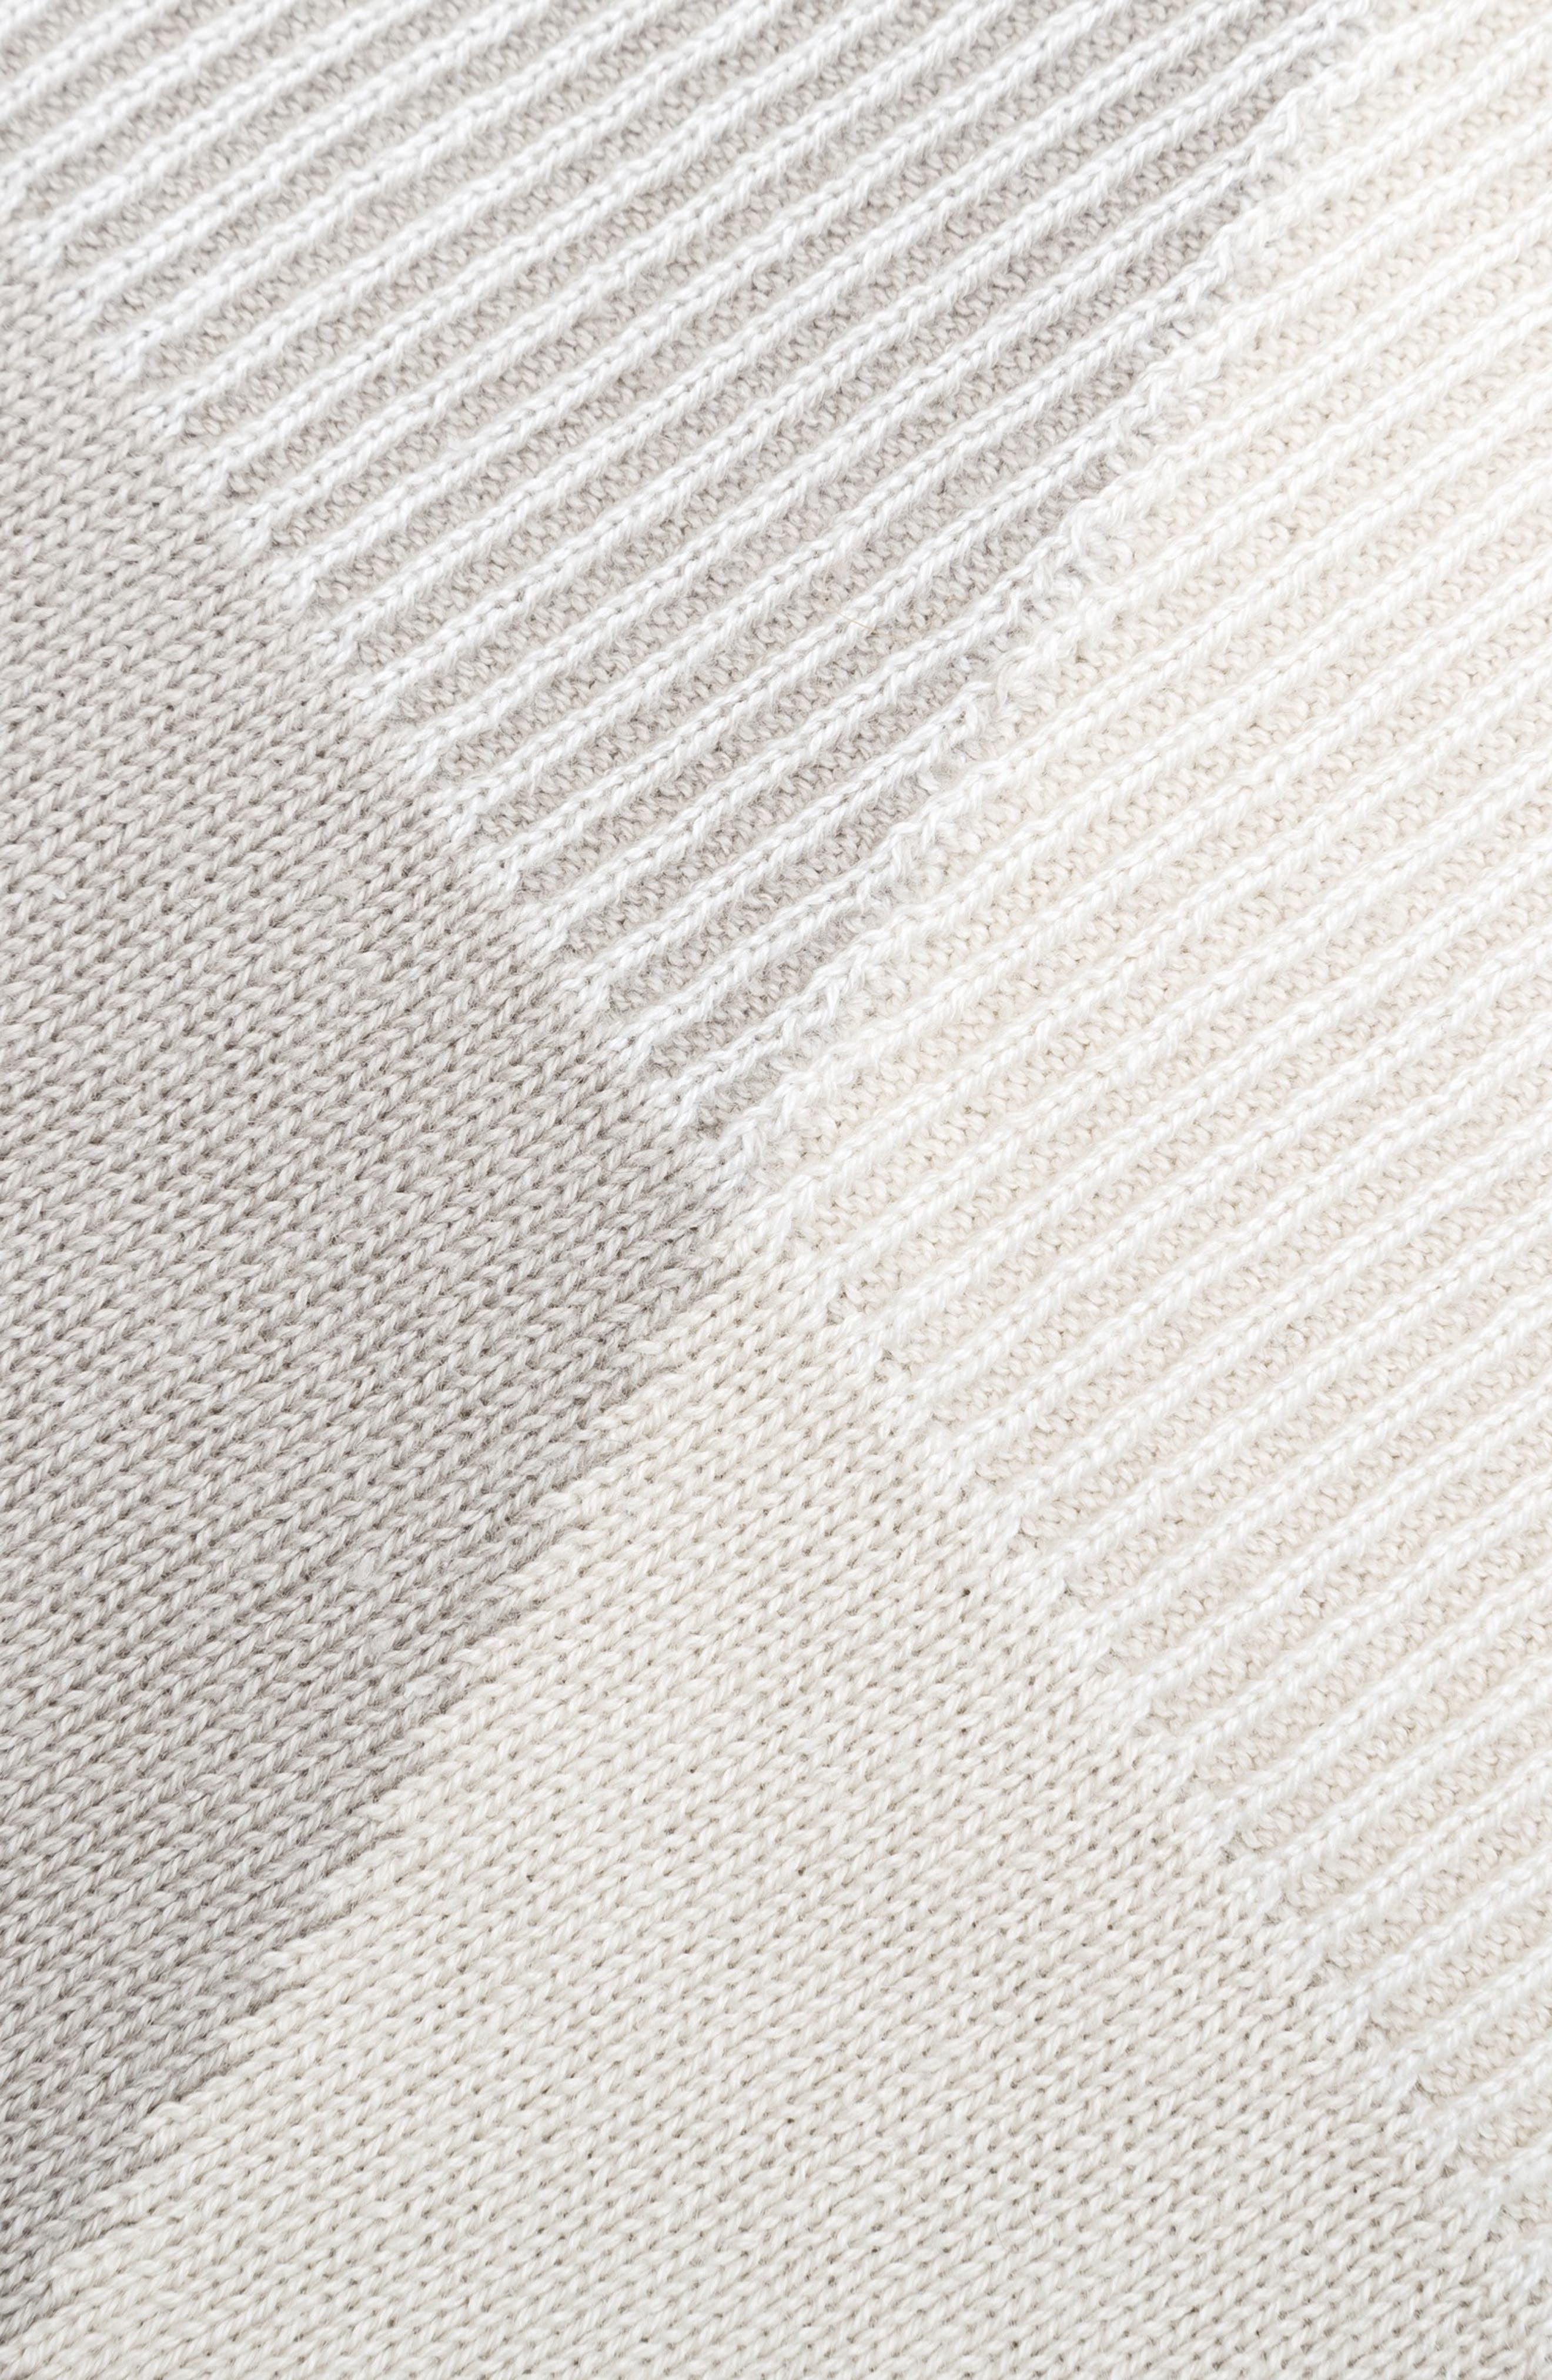 Organic Cotton Knit Blanket,                             Alternate thumbnail 2, color,                             BEIGE